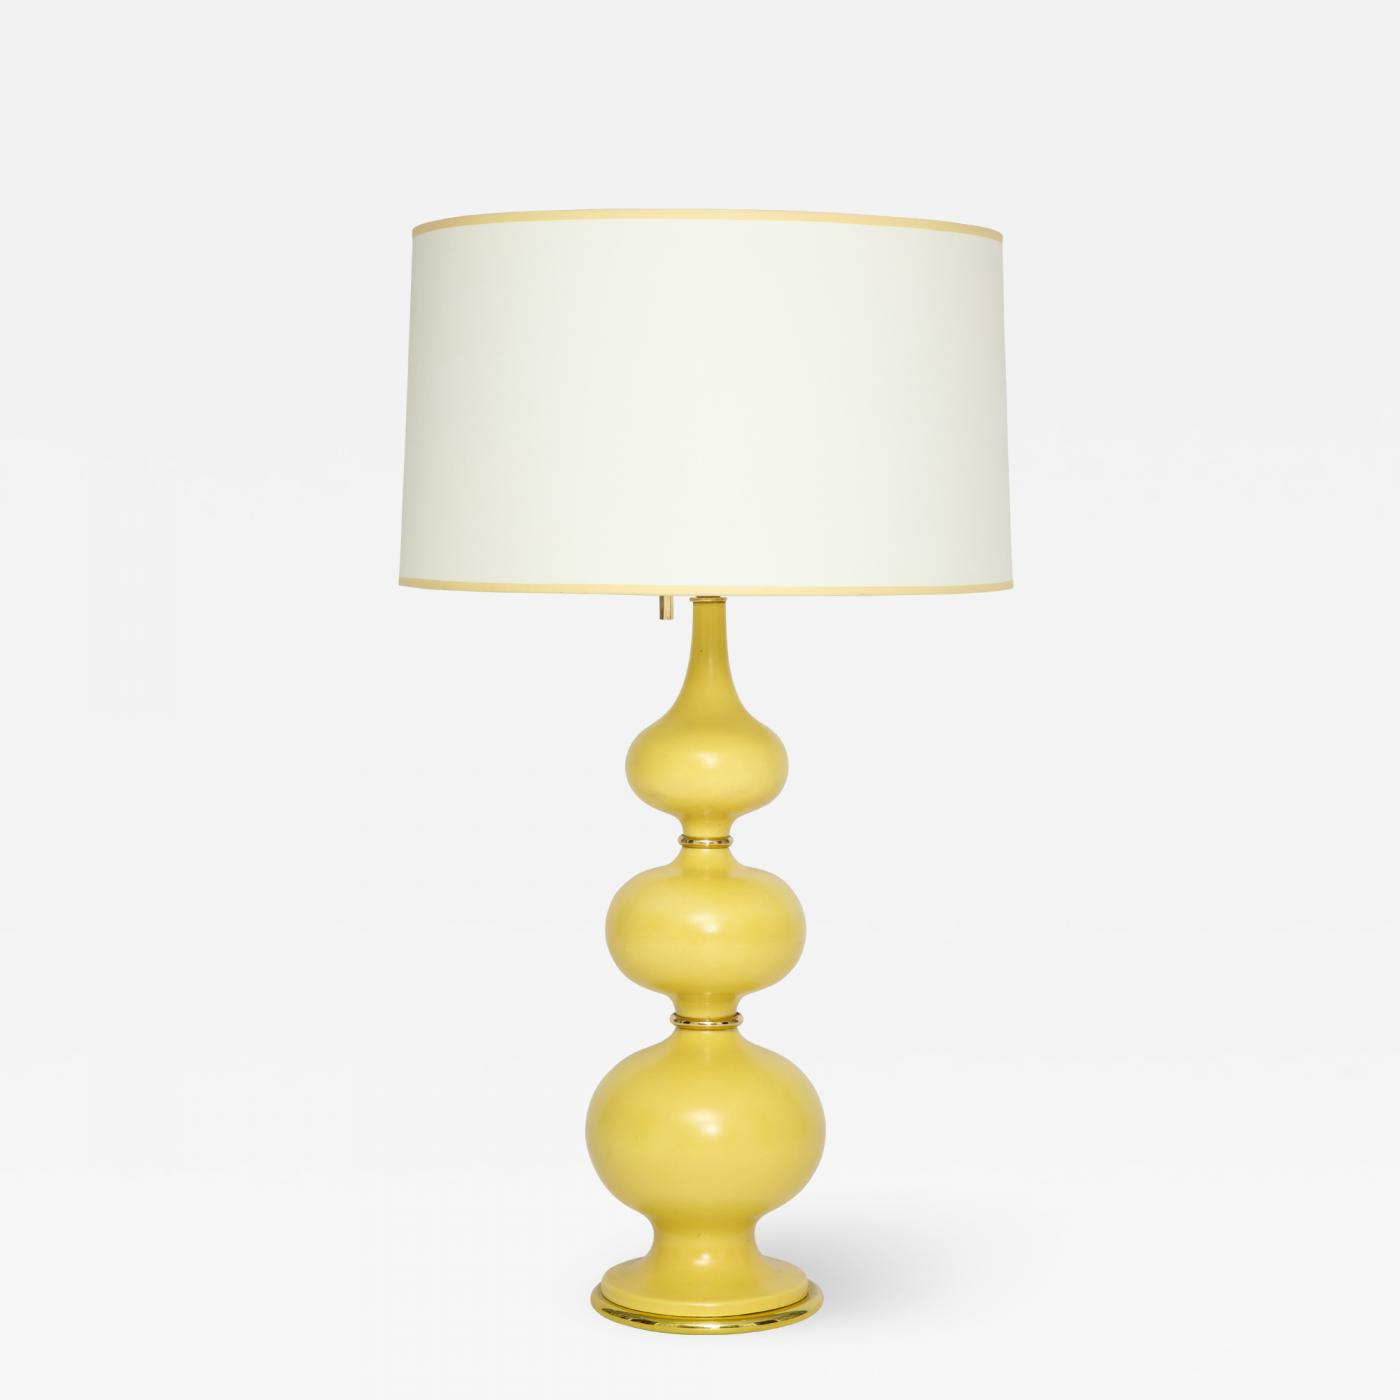 Atomic Lamp by Gerald Thurston for Lightolier